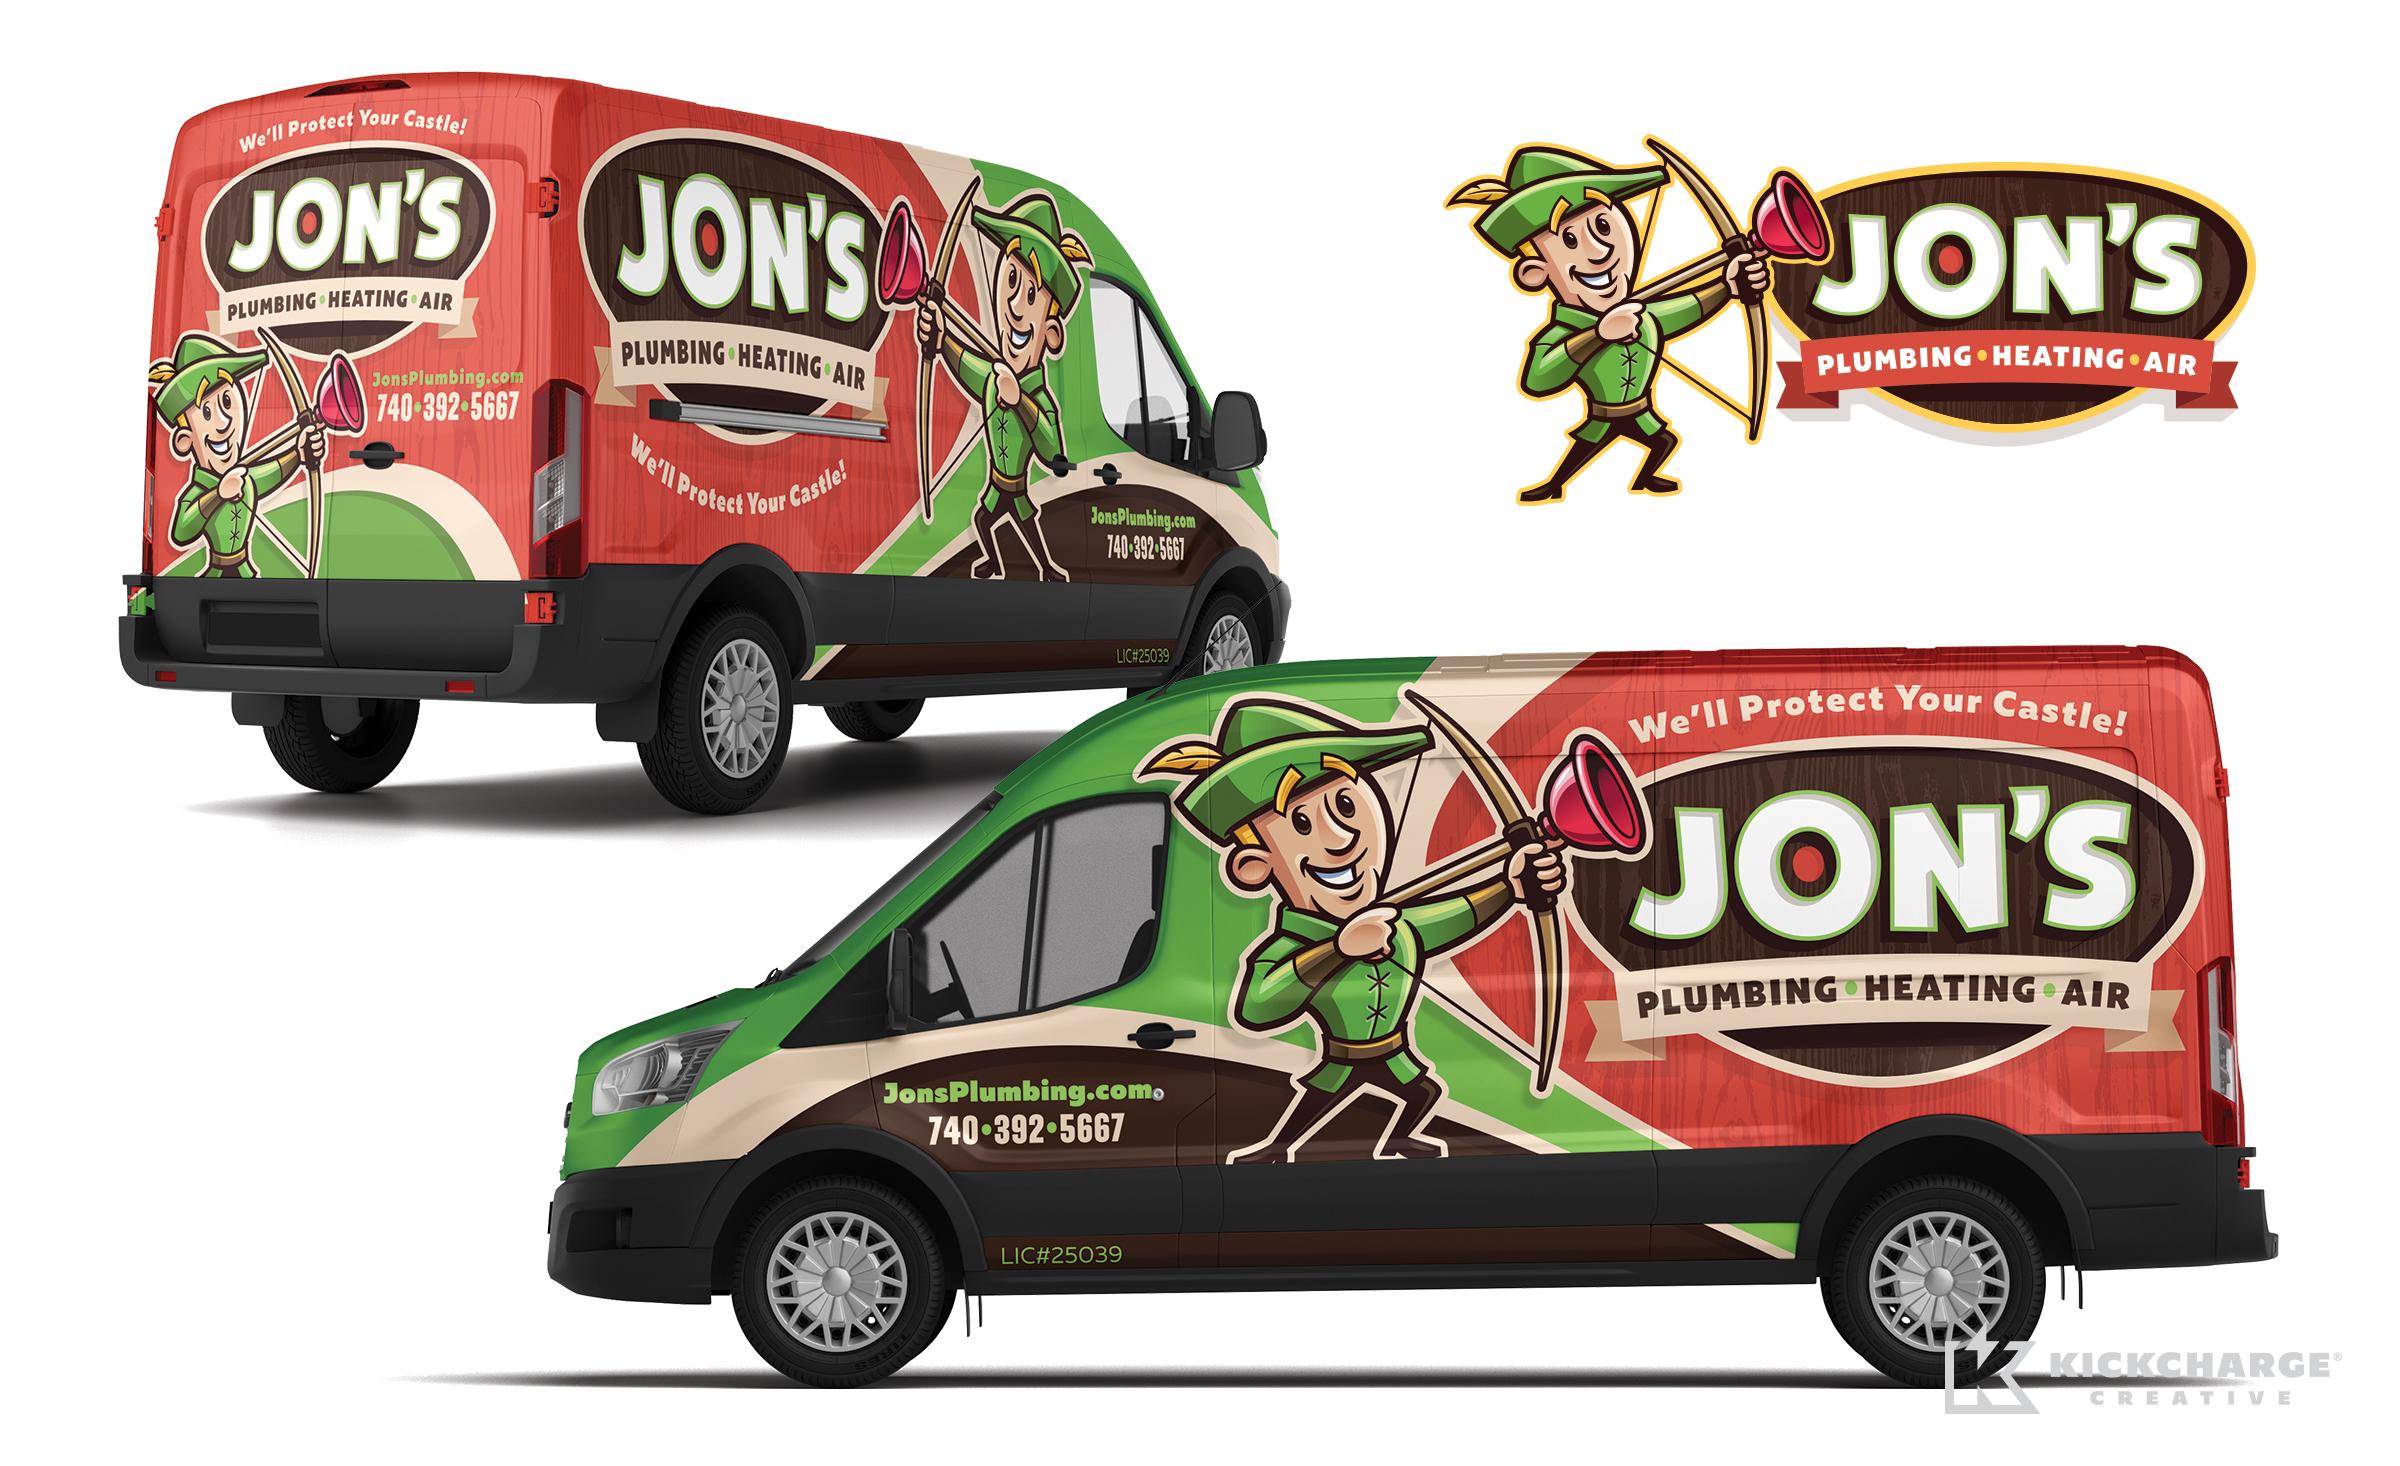 hvac and plumbing truck wrap for Jon's Plumbing, Heating & Air